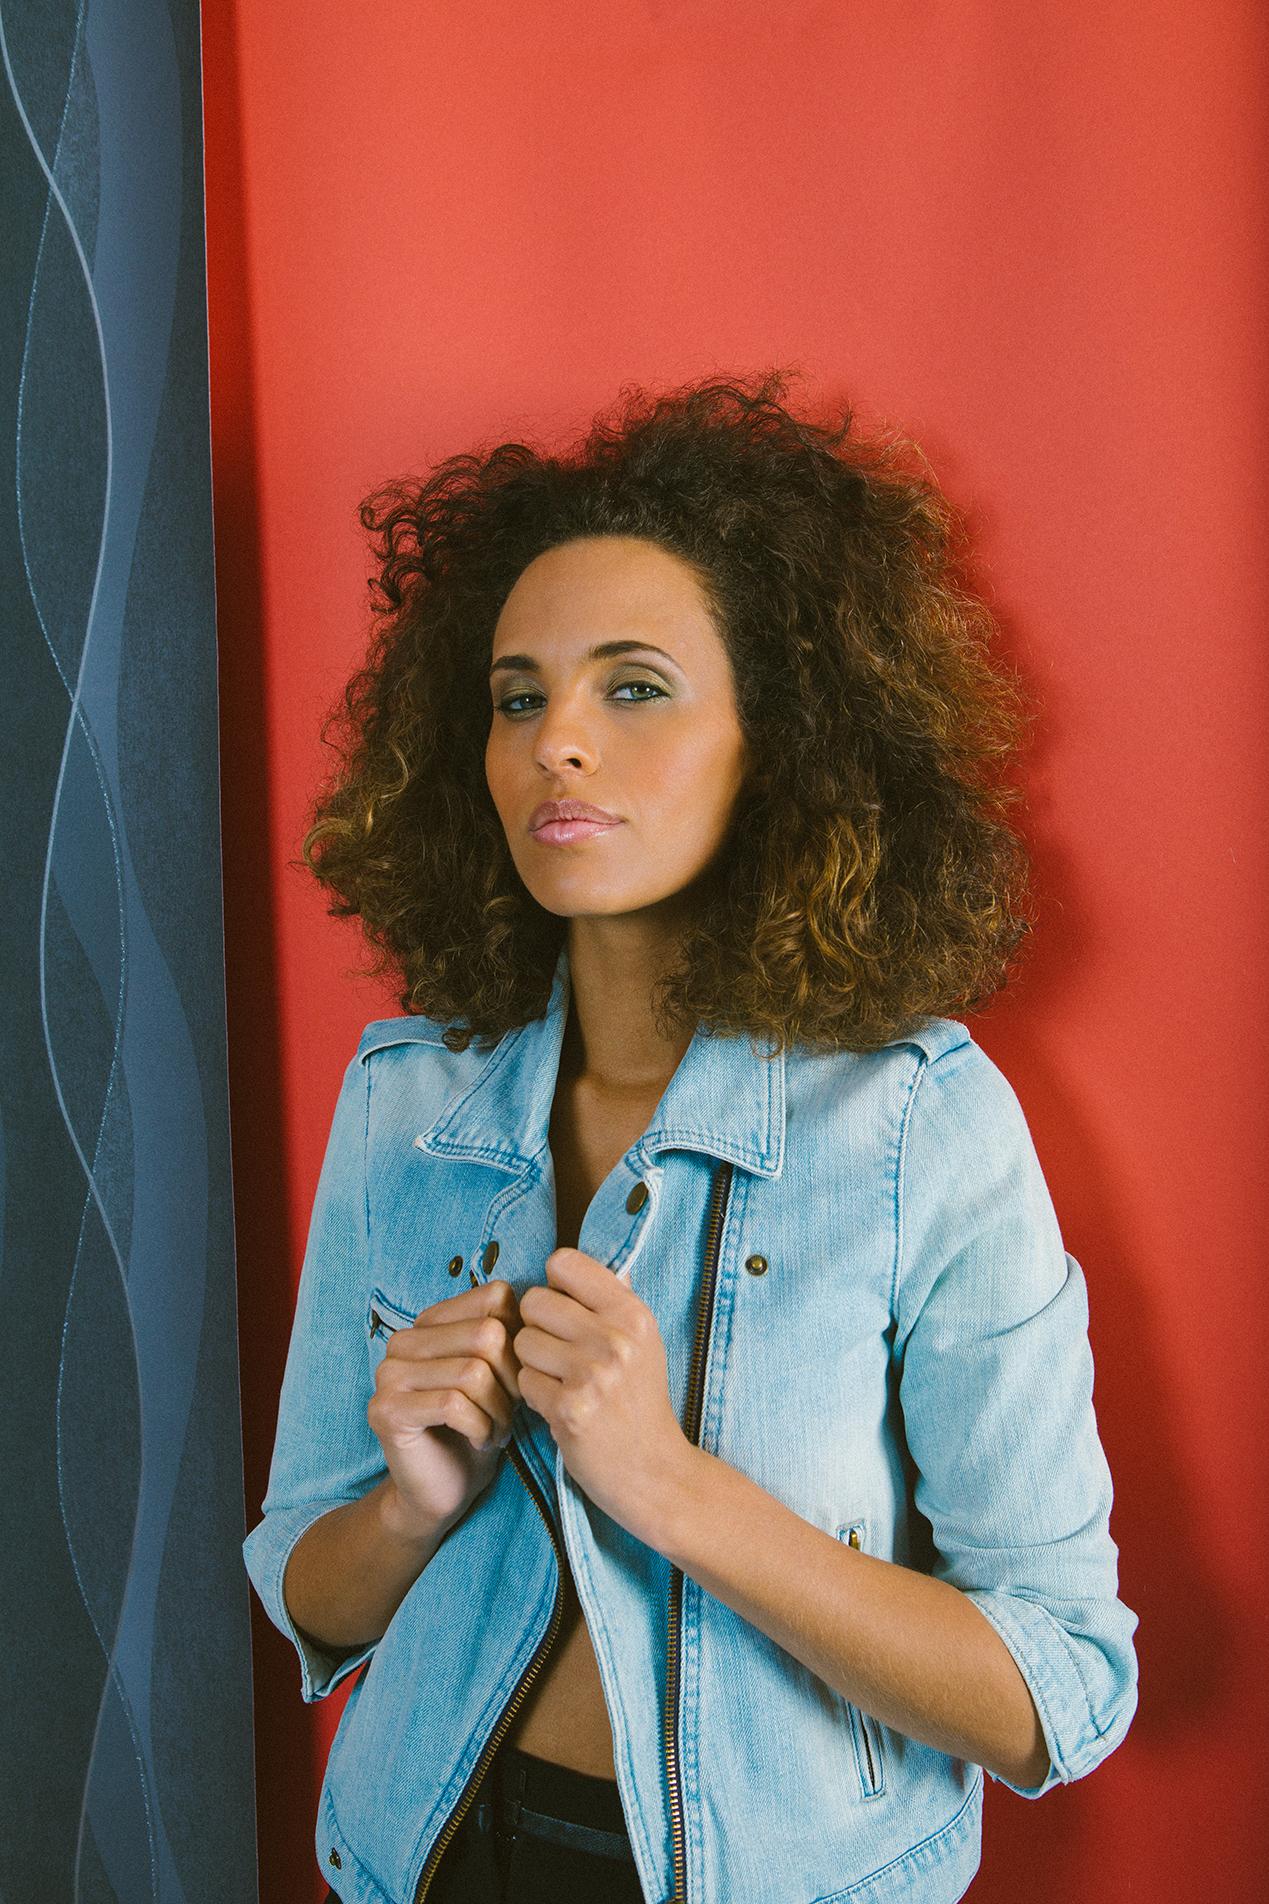 Paula Vip Models by alexis jacquin-1061_web.jpg